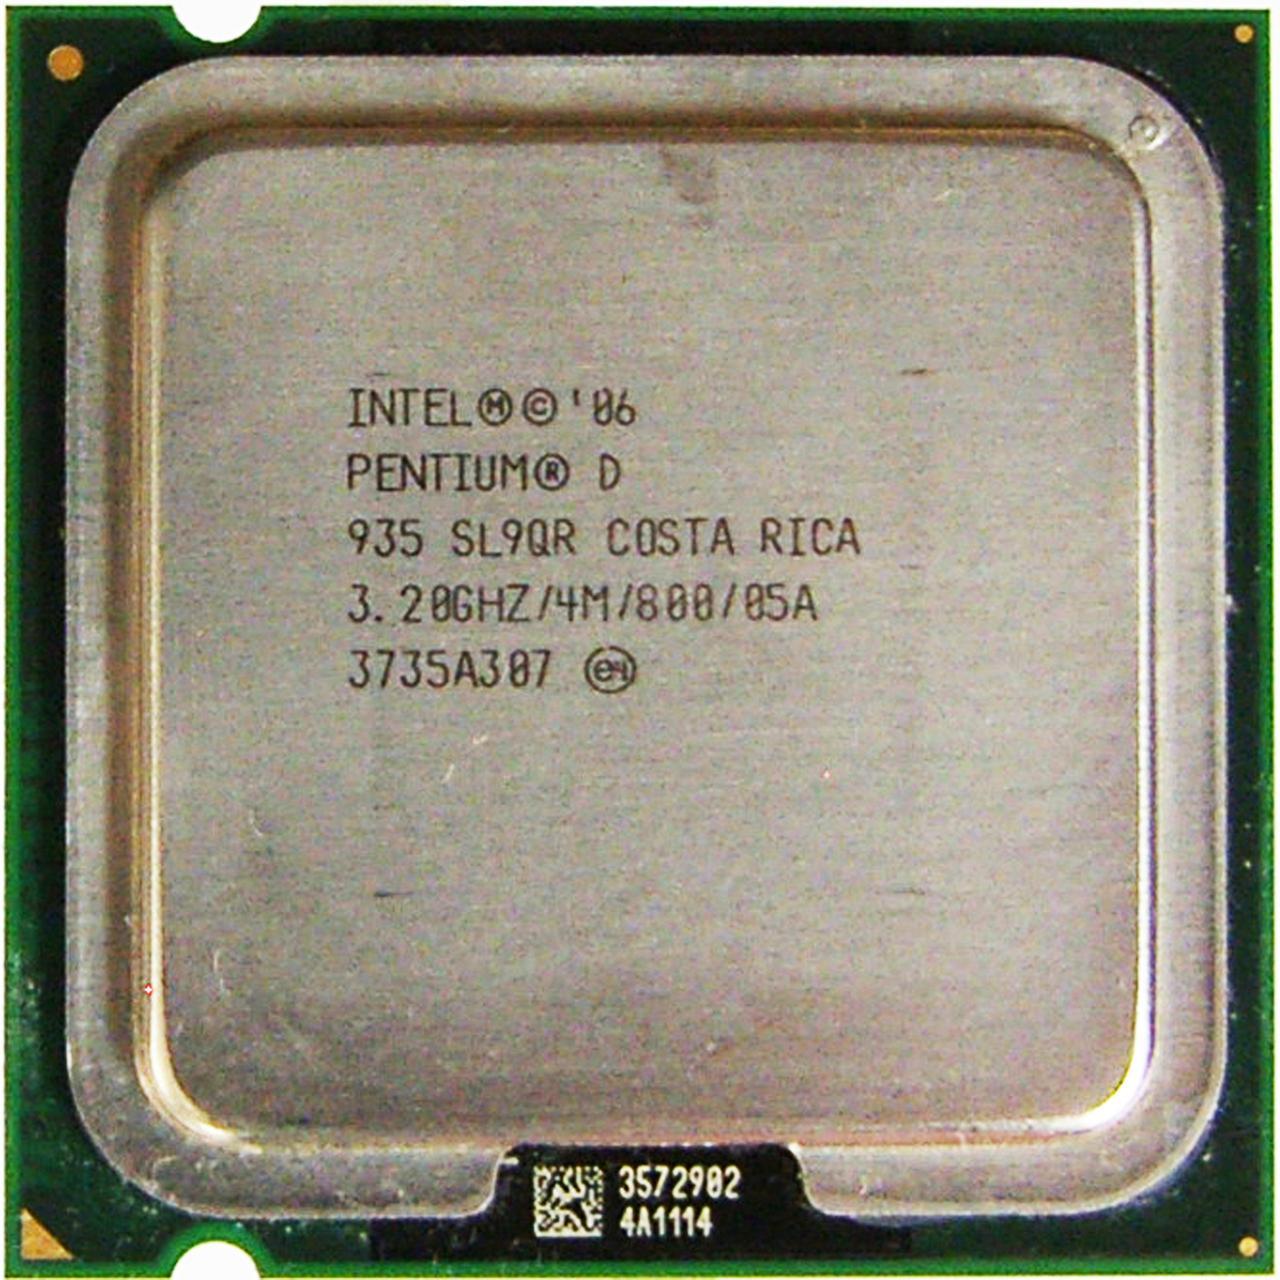 Процессор Intel Pentium D 935 3.20GHz/4M/800 (SL9QR) s775, tray